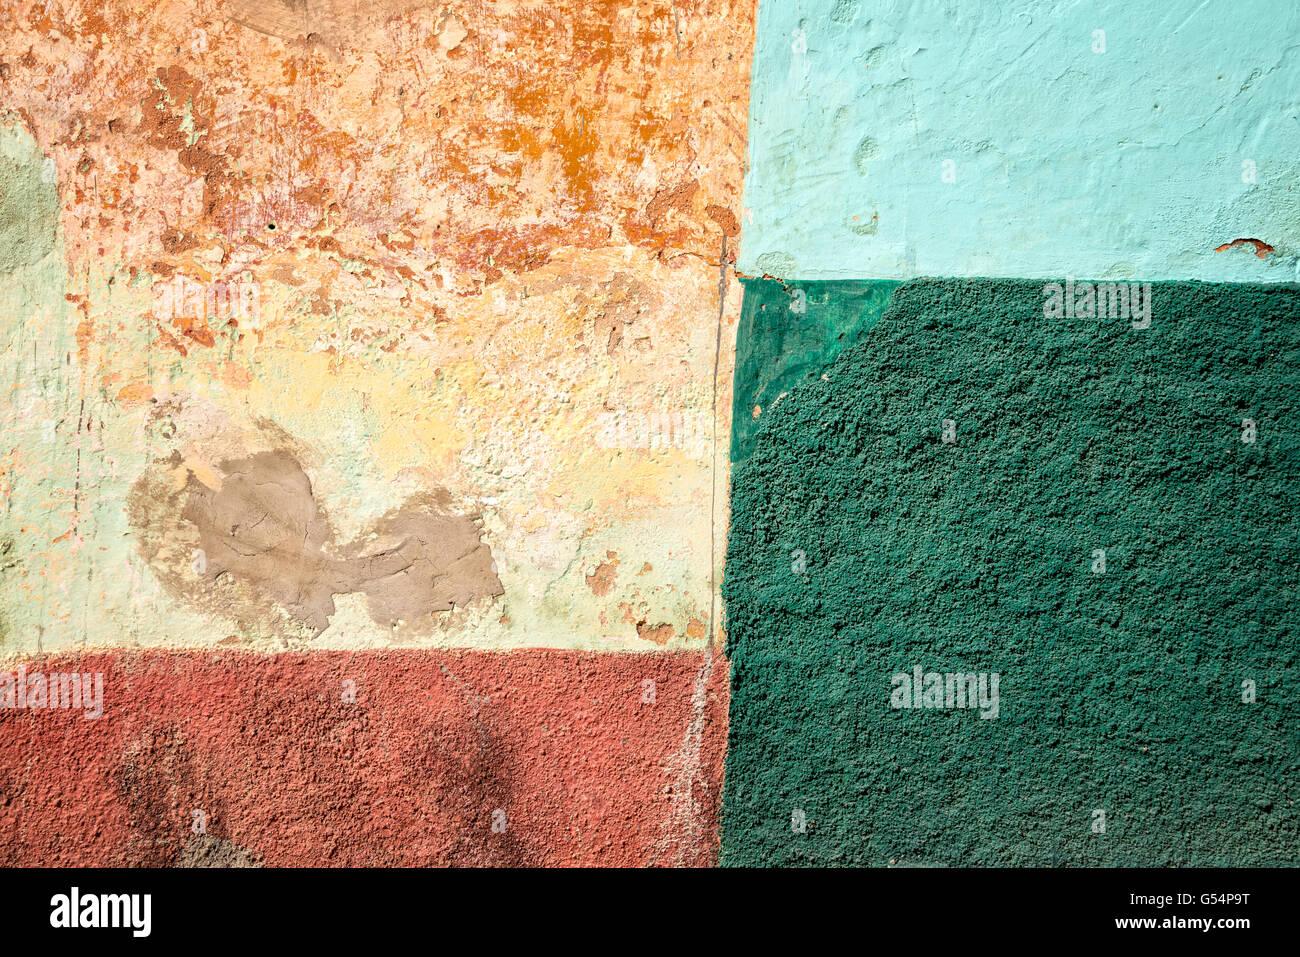 Colorful walls of Trinidad, Cuba Stock Photo: 106440820 - Alamy